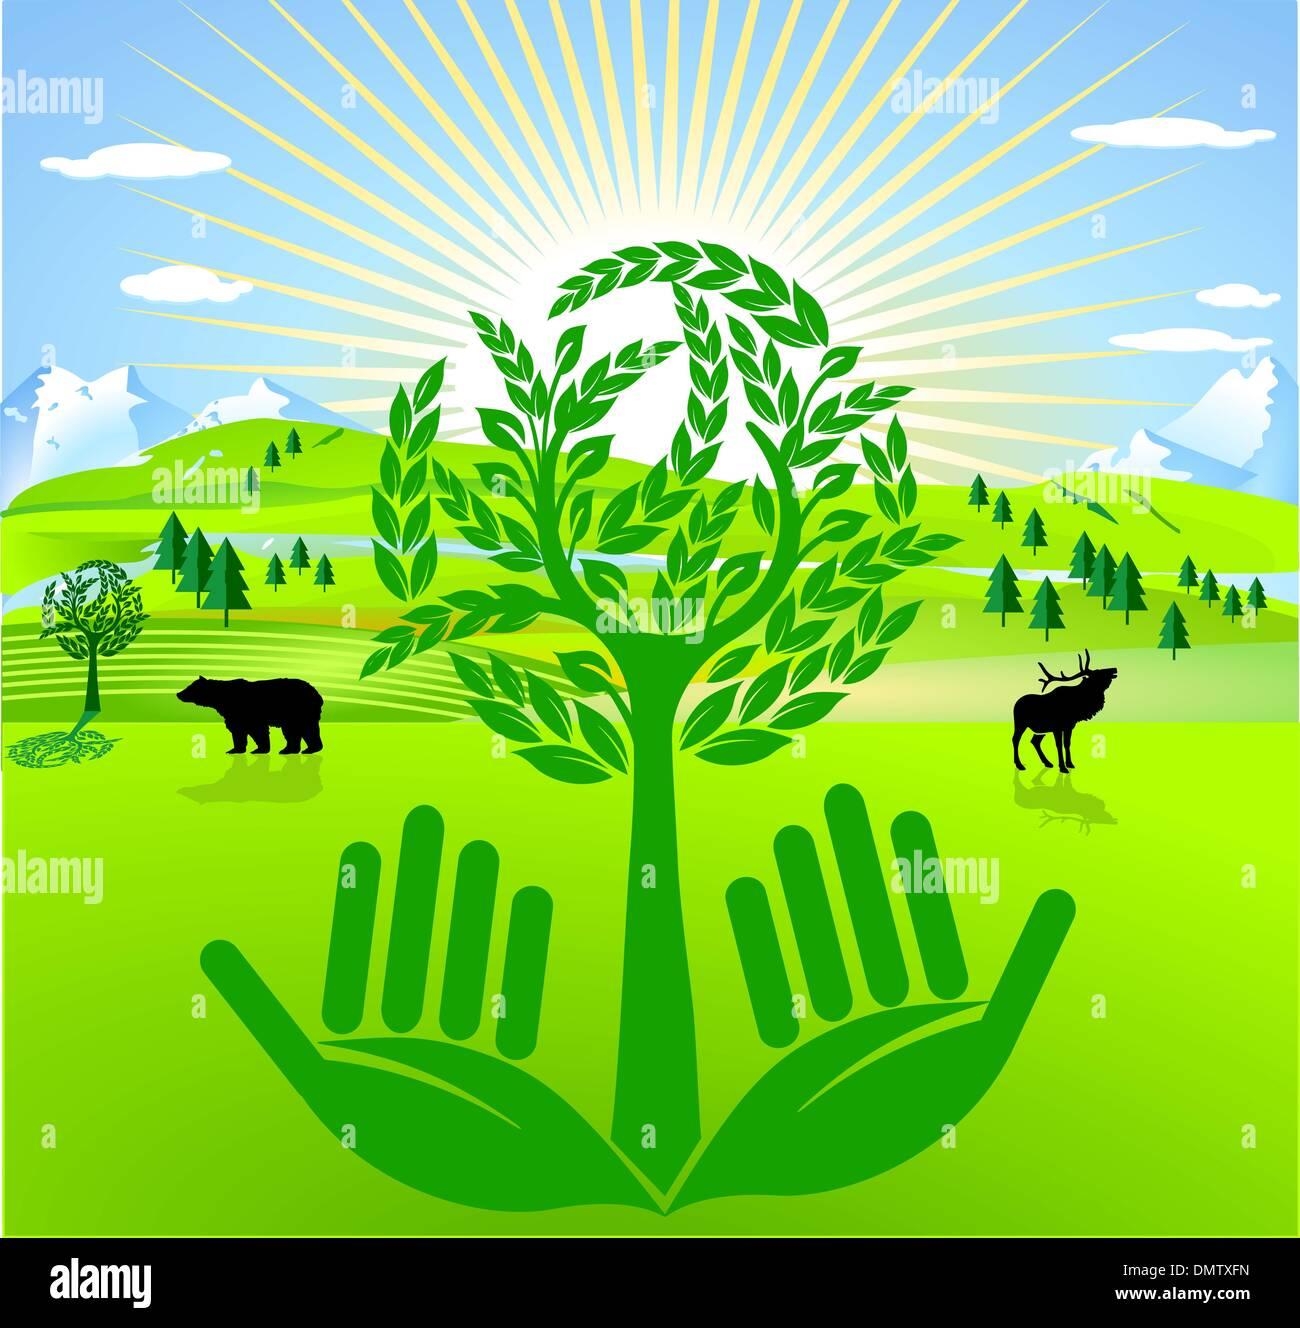 preventive environmental protection - Stock Image